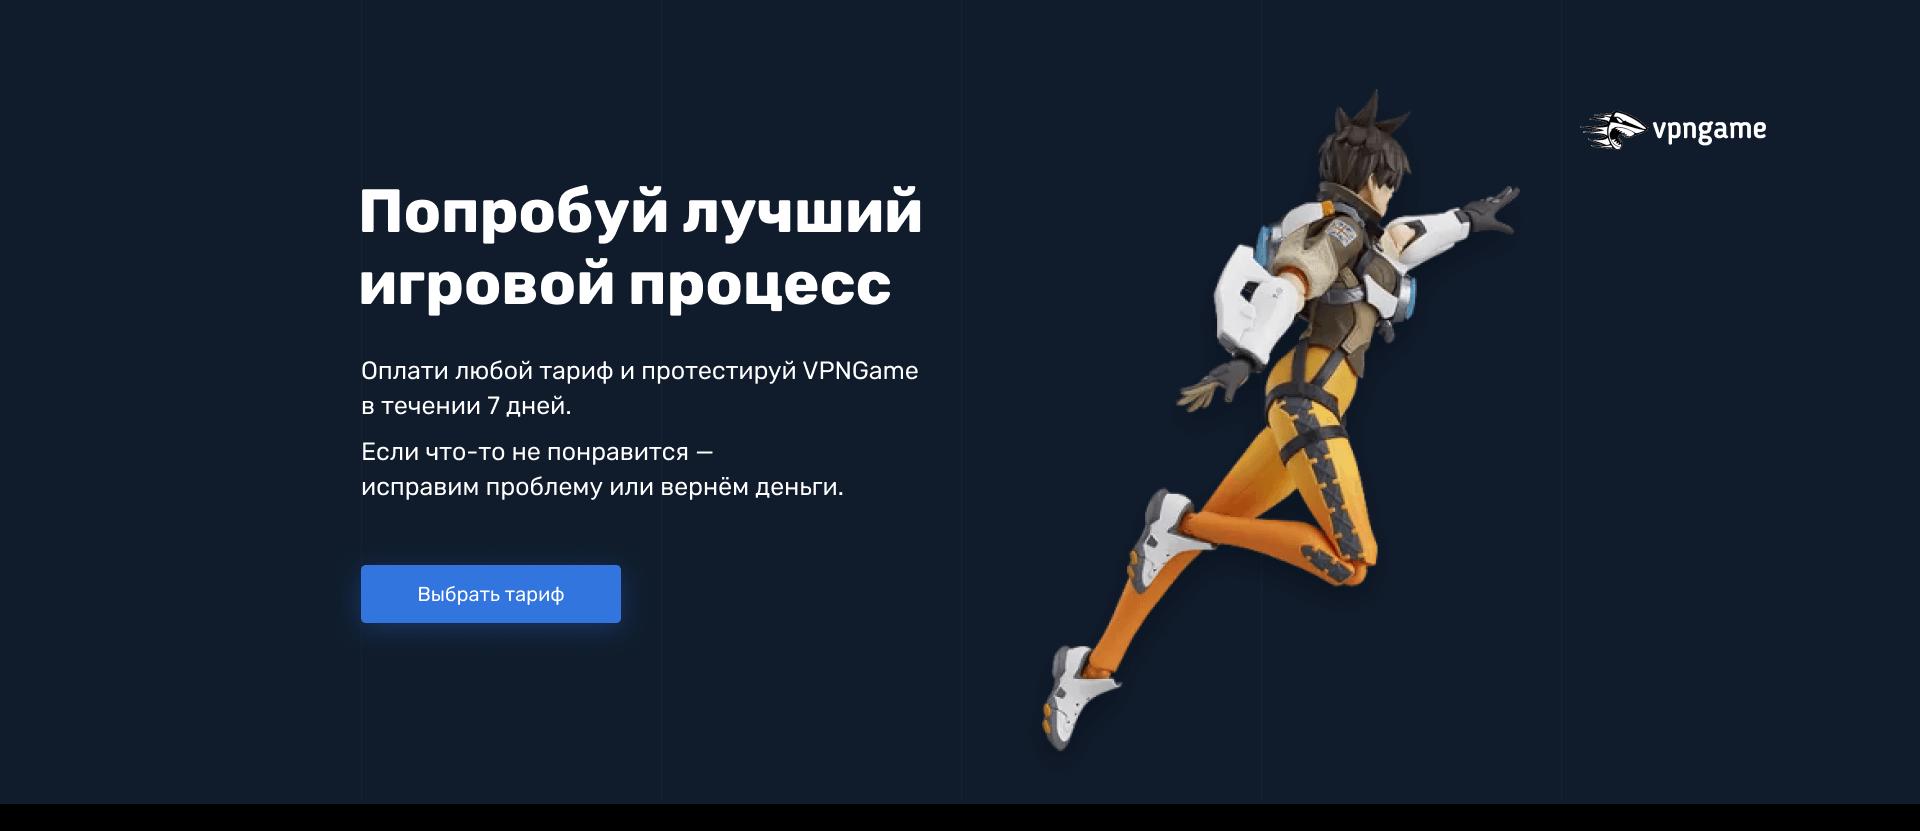 Дизайн и вёрстка проекта VPNGame 44